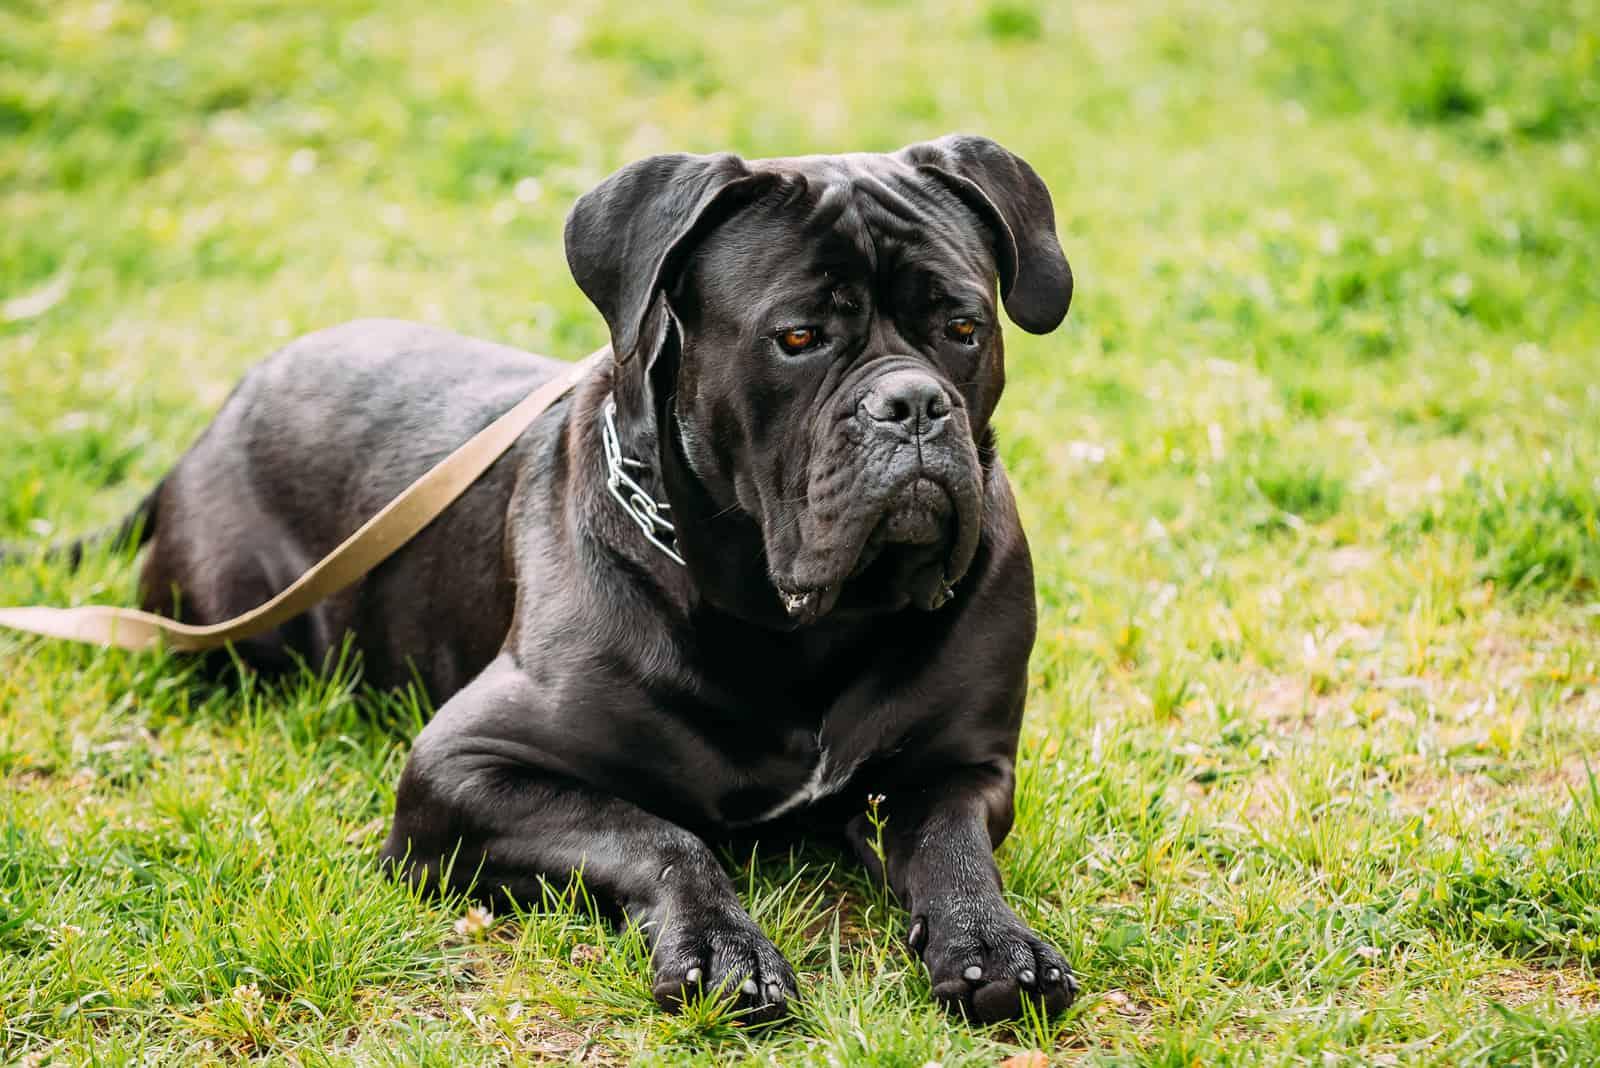 black Cane Corso lying on the grass